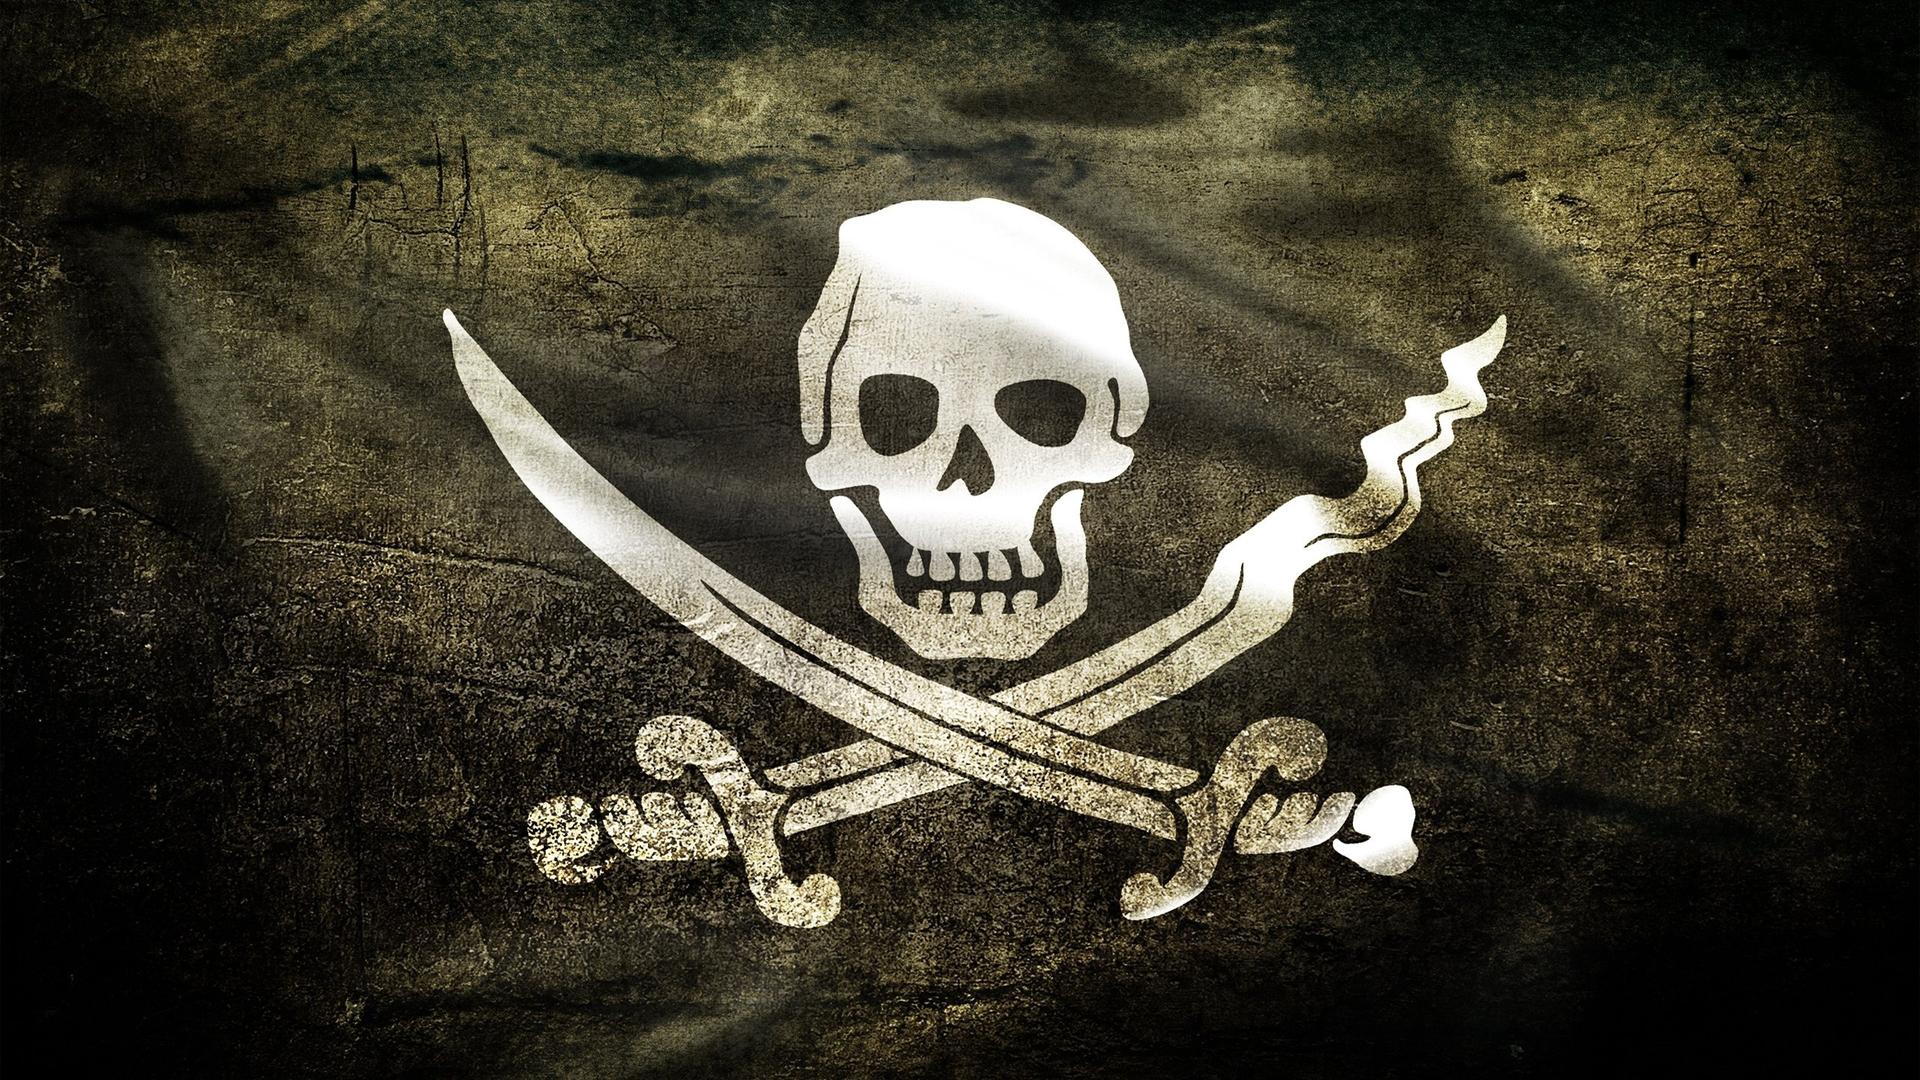 wallpaper skull bones pirate cross desktop 1920x1080 1920x1080